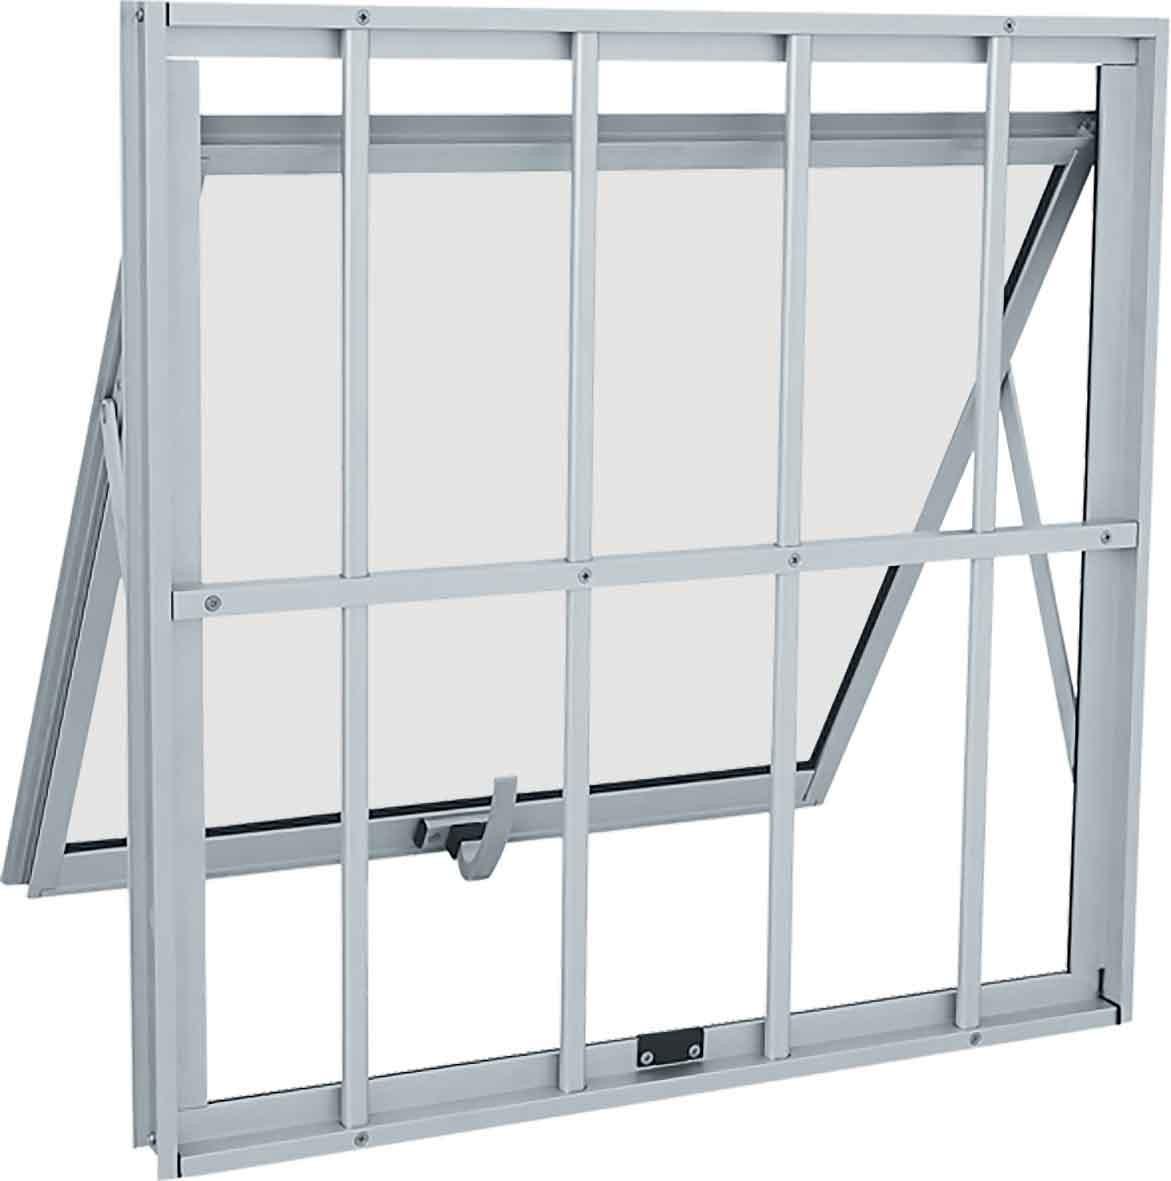 Janela Maxim-ar Grade Classic Alumínio 60X60 - Branco